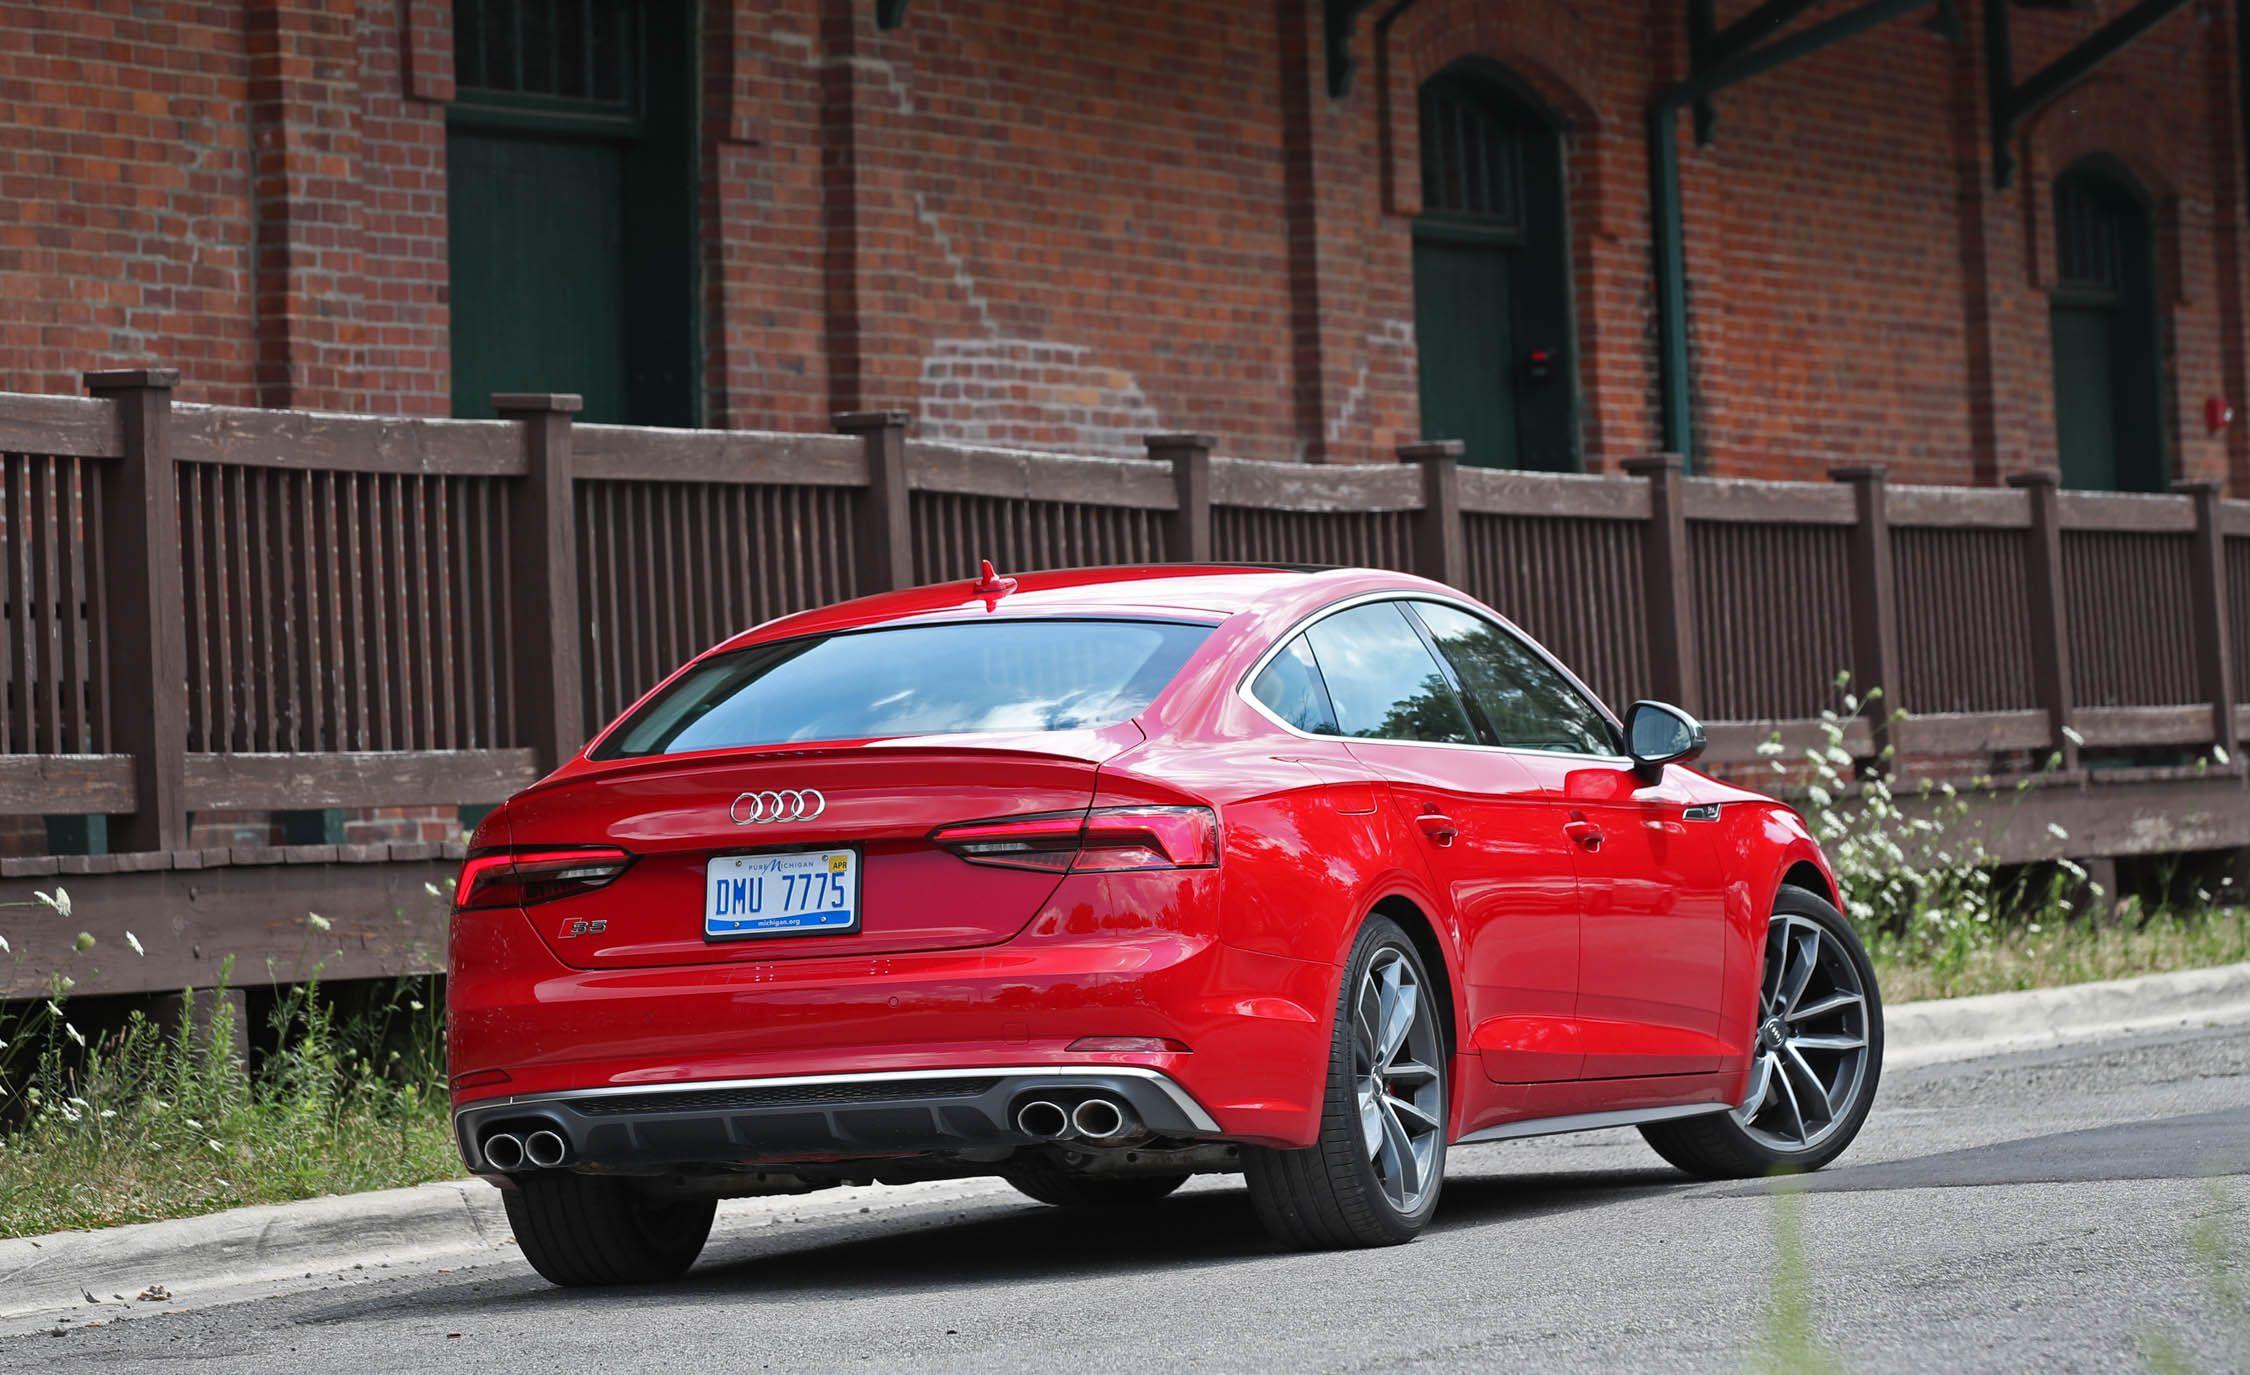 2019 audi s5 sportback reviews audi s5 sportback price photos rh caranddriver com